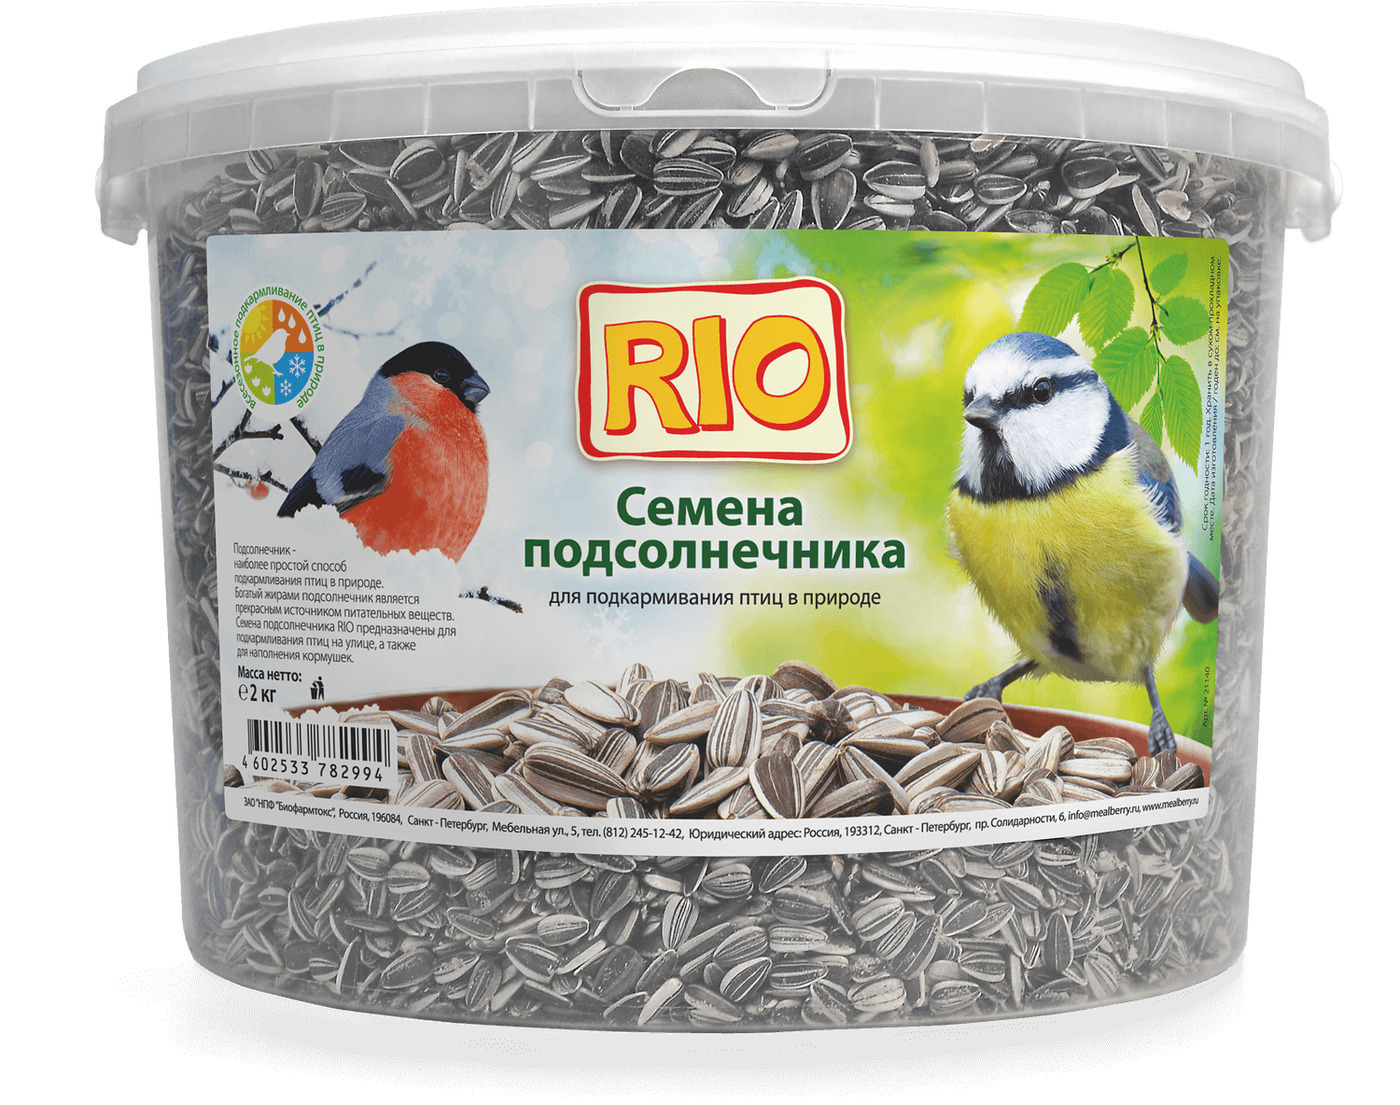 [14.712]  РИО Семена подсолнечника (для подкармливания птиц) ведро 2кг 21140